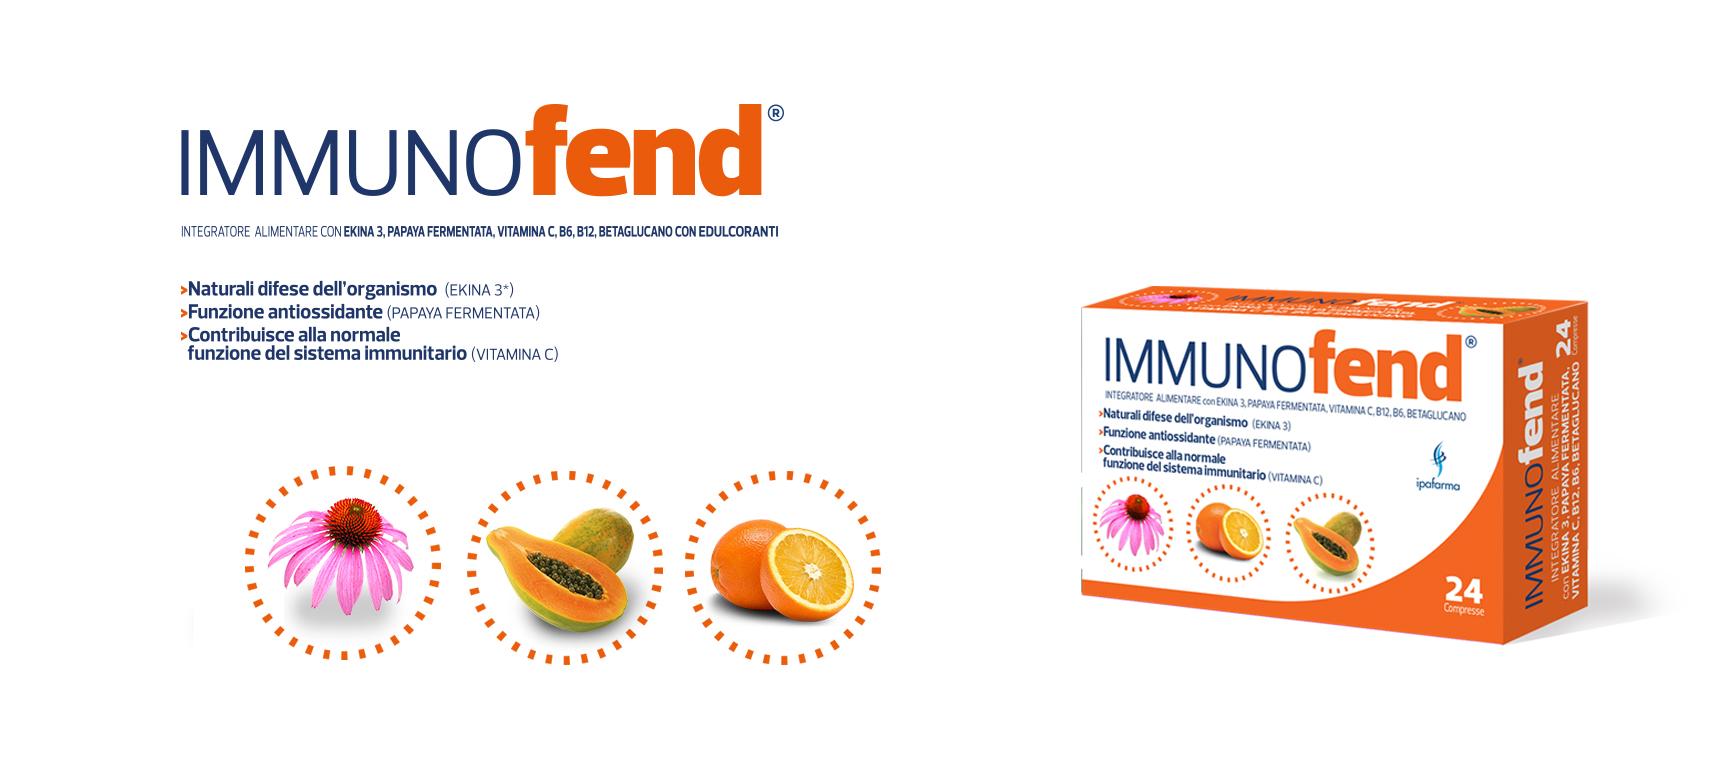 immunofend